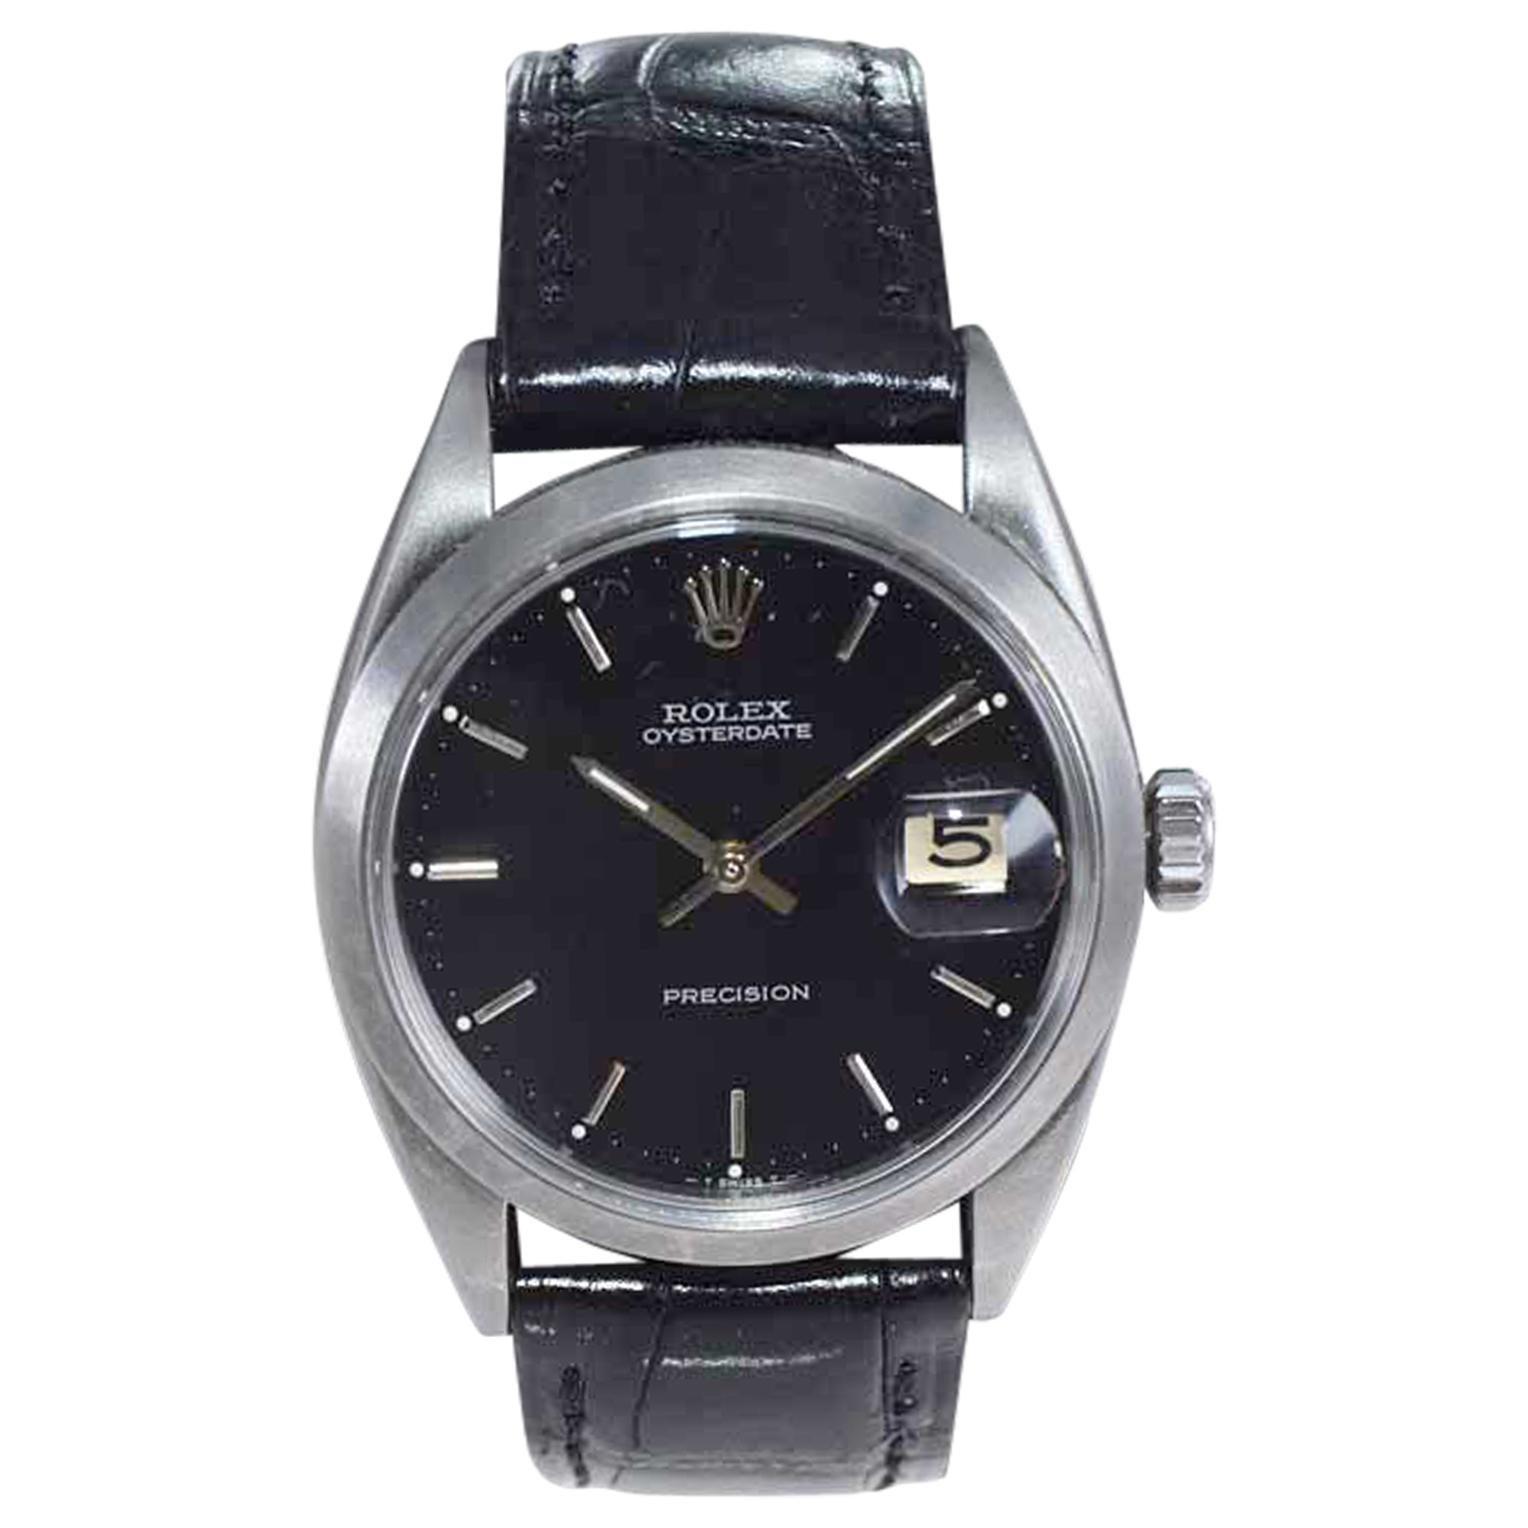 Rolex Oysterdate Black Dial Watch, circa 1969 with a Custom Carbonized Finish